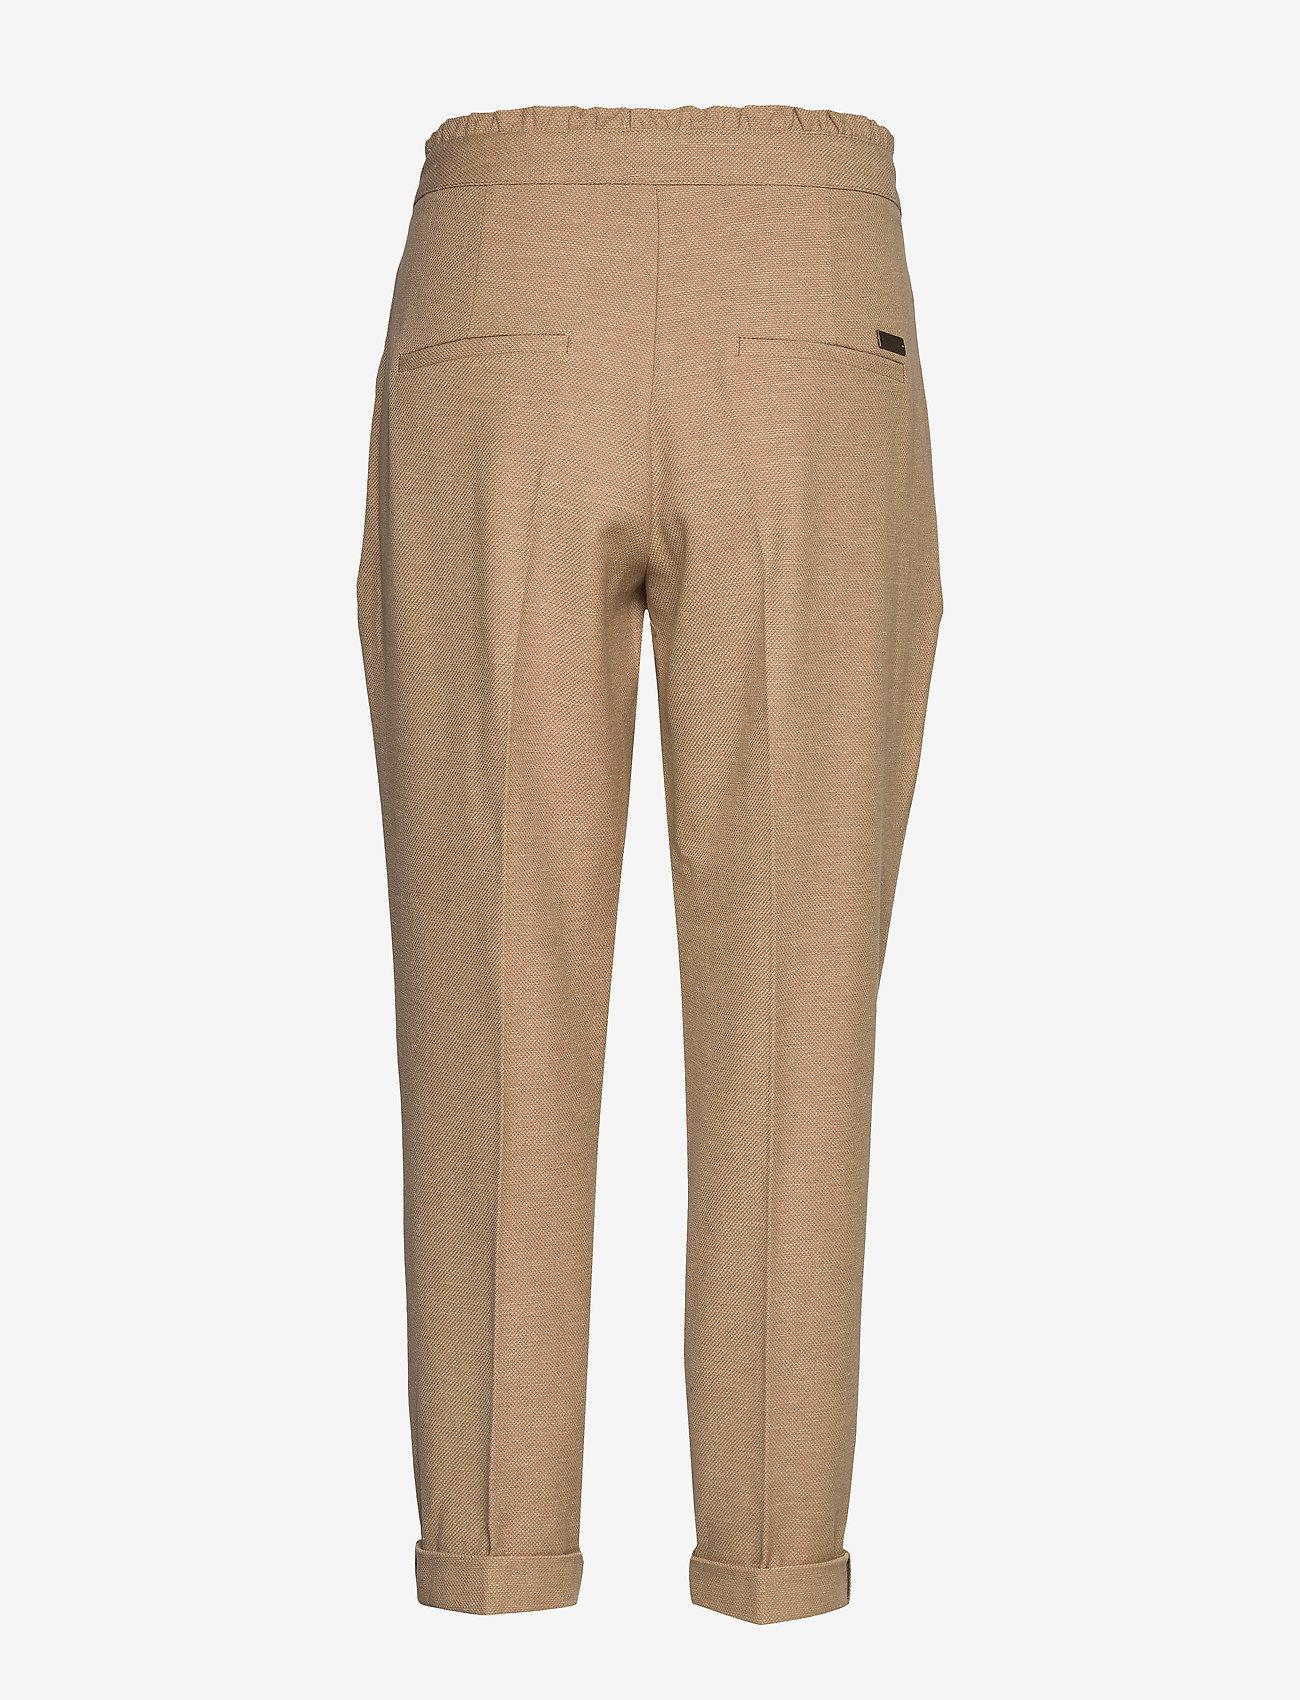 Mos Mosh Nolan Linen Pant - Trousers